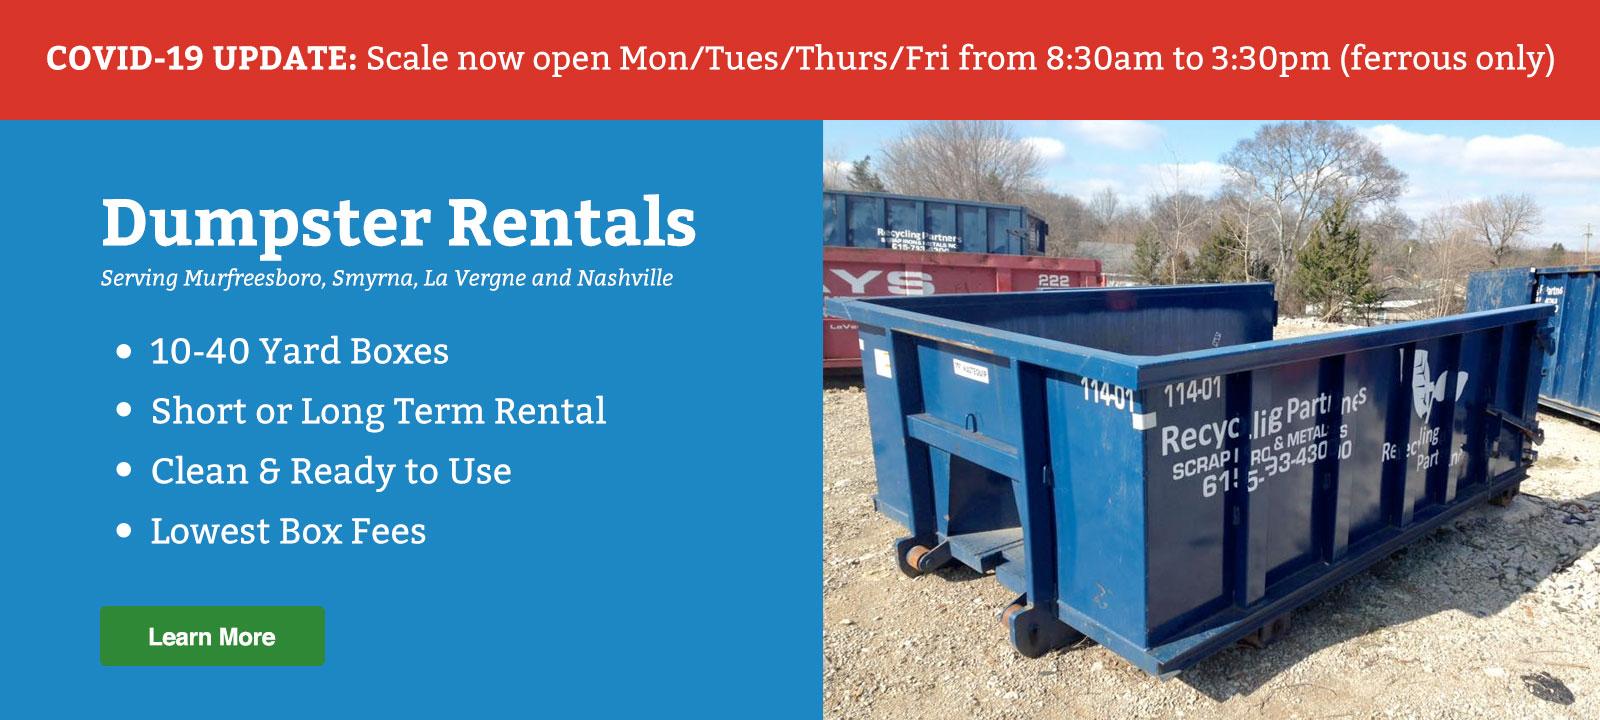 nashville dumpster rentals scrap metal recycling murfreesboro franklin brentwood dumpster rent